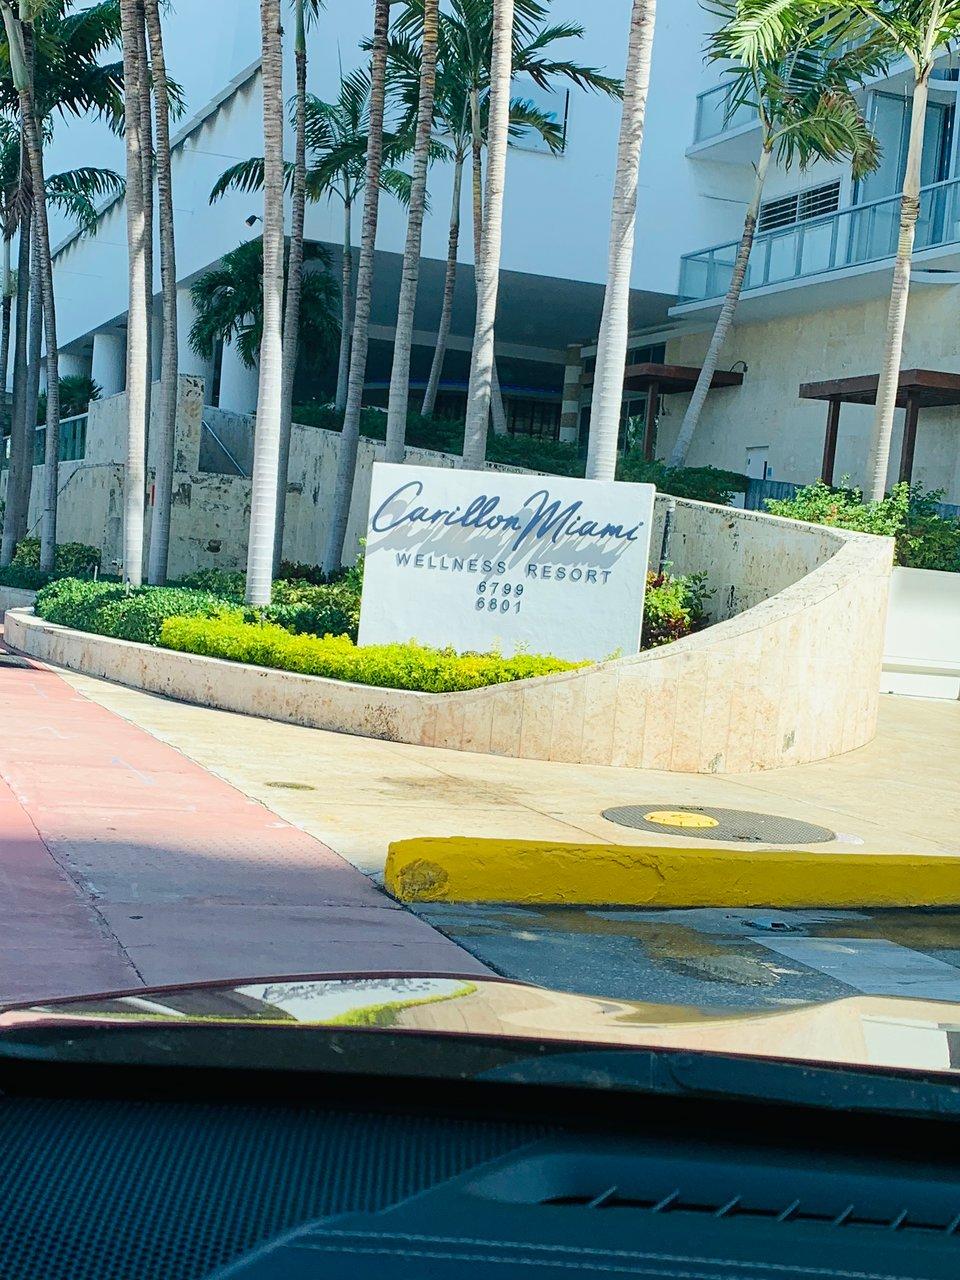 THE 10 BEST Things to Do Near Hilton Cabana Miami Beach